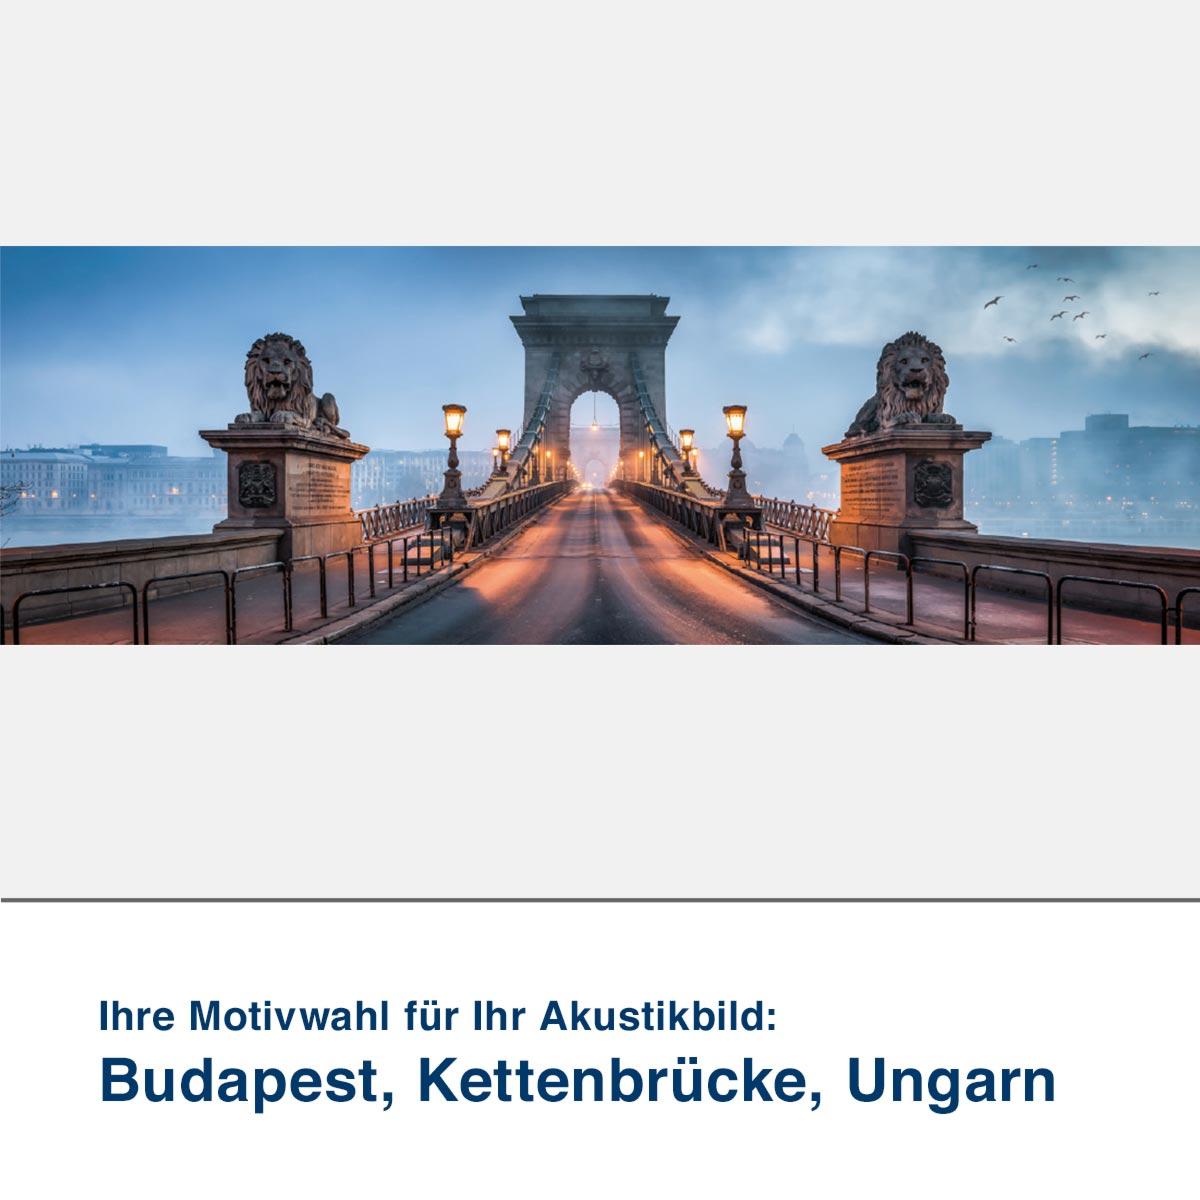 Akustikbild Motiv Budapest, Kettenbrücke, Ungarn